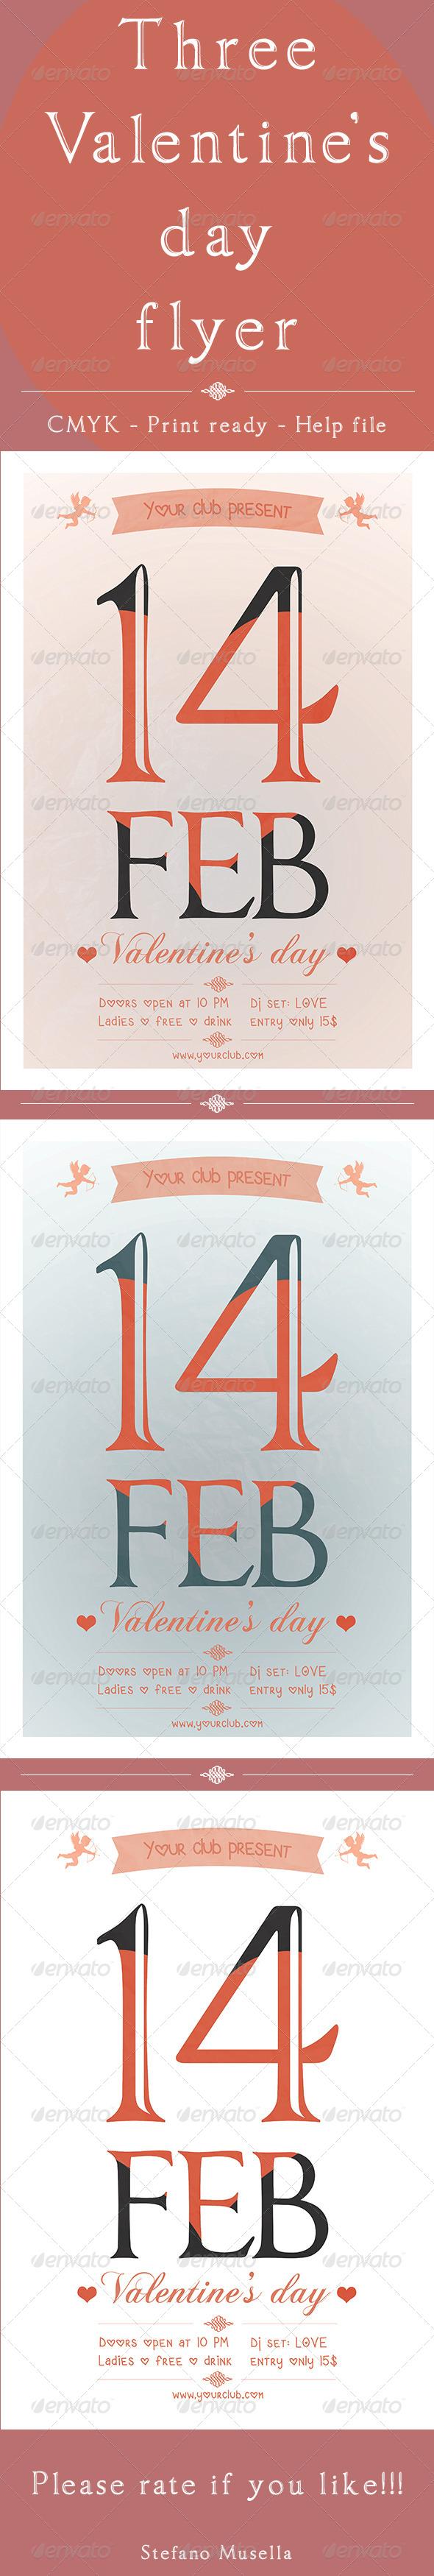 GraphicRiver Valentine s day flyer 6425408